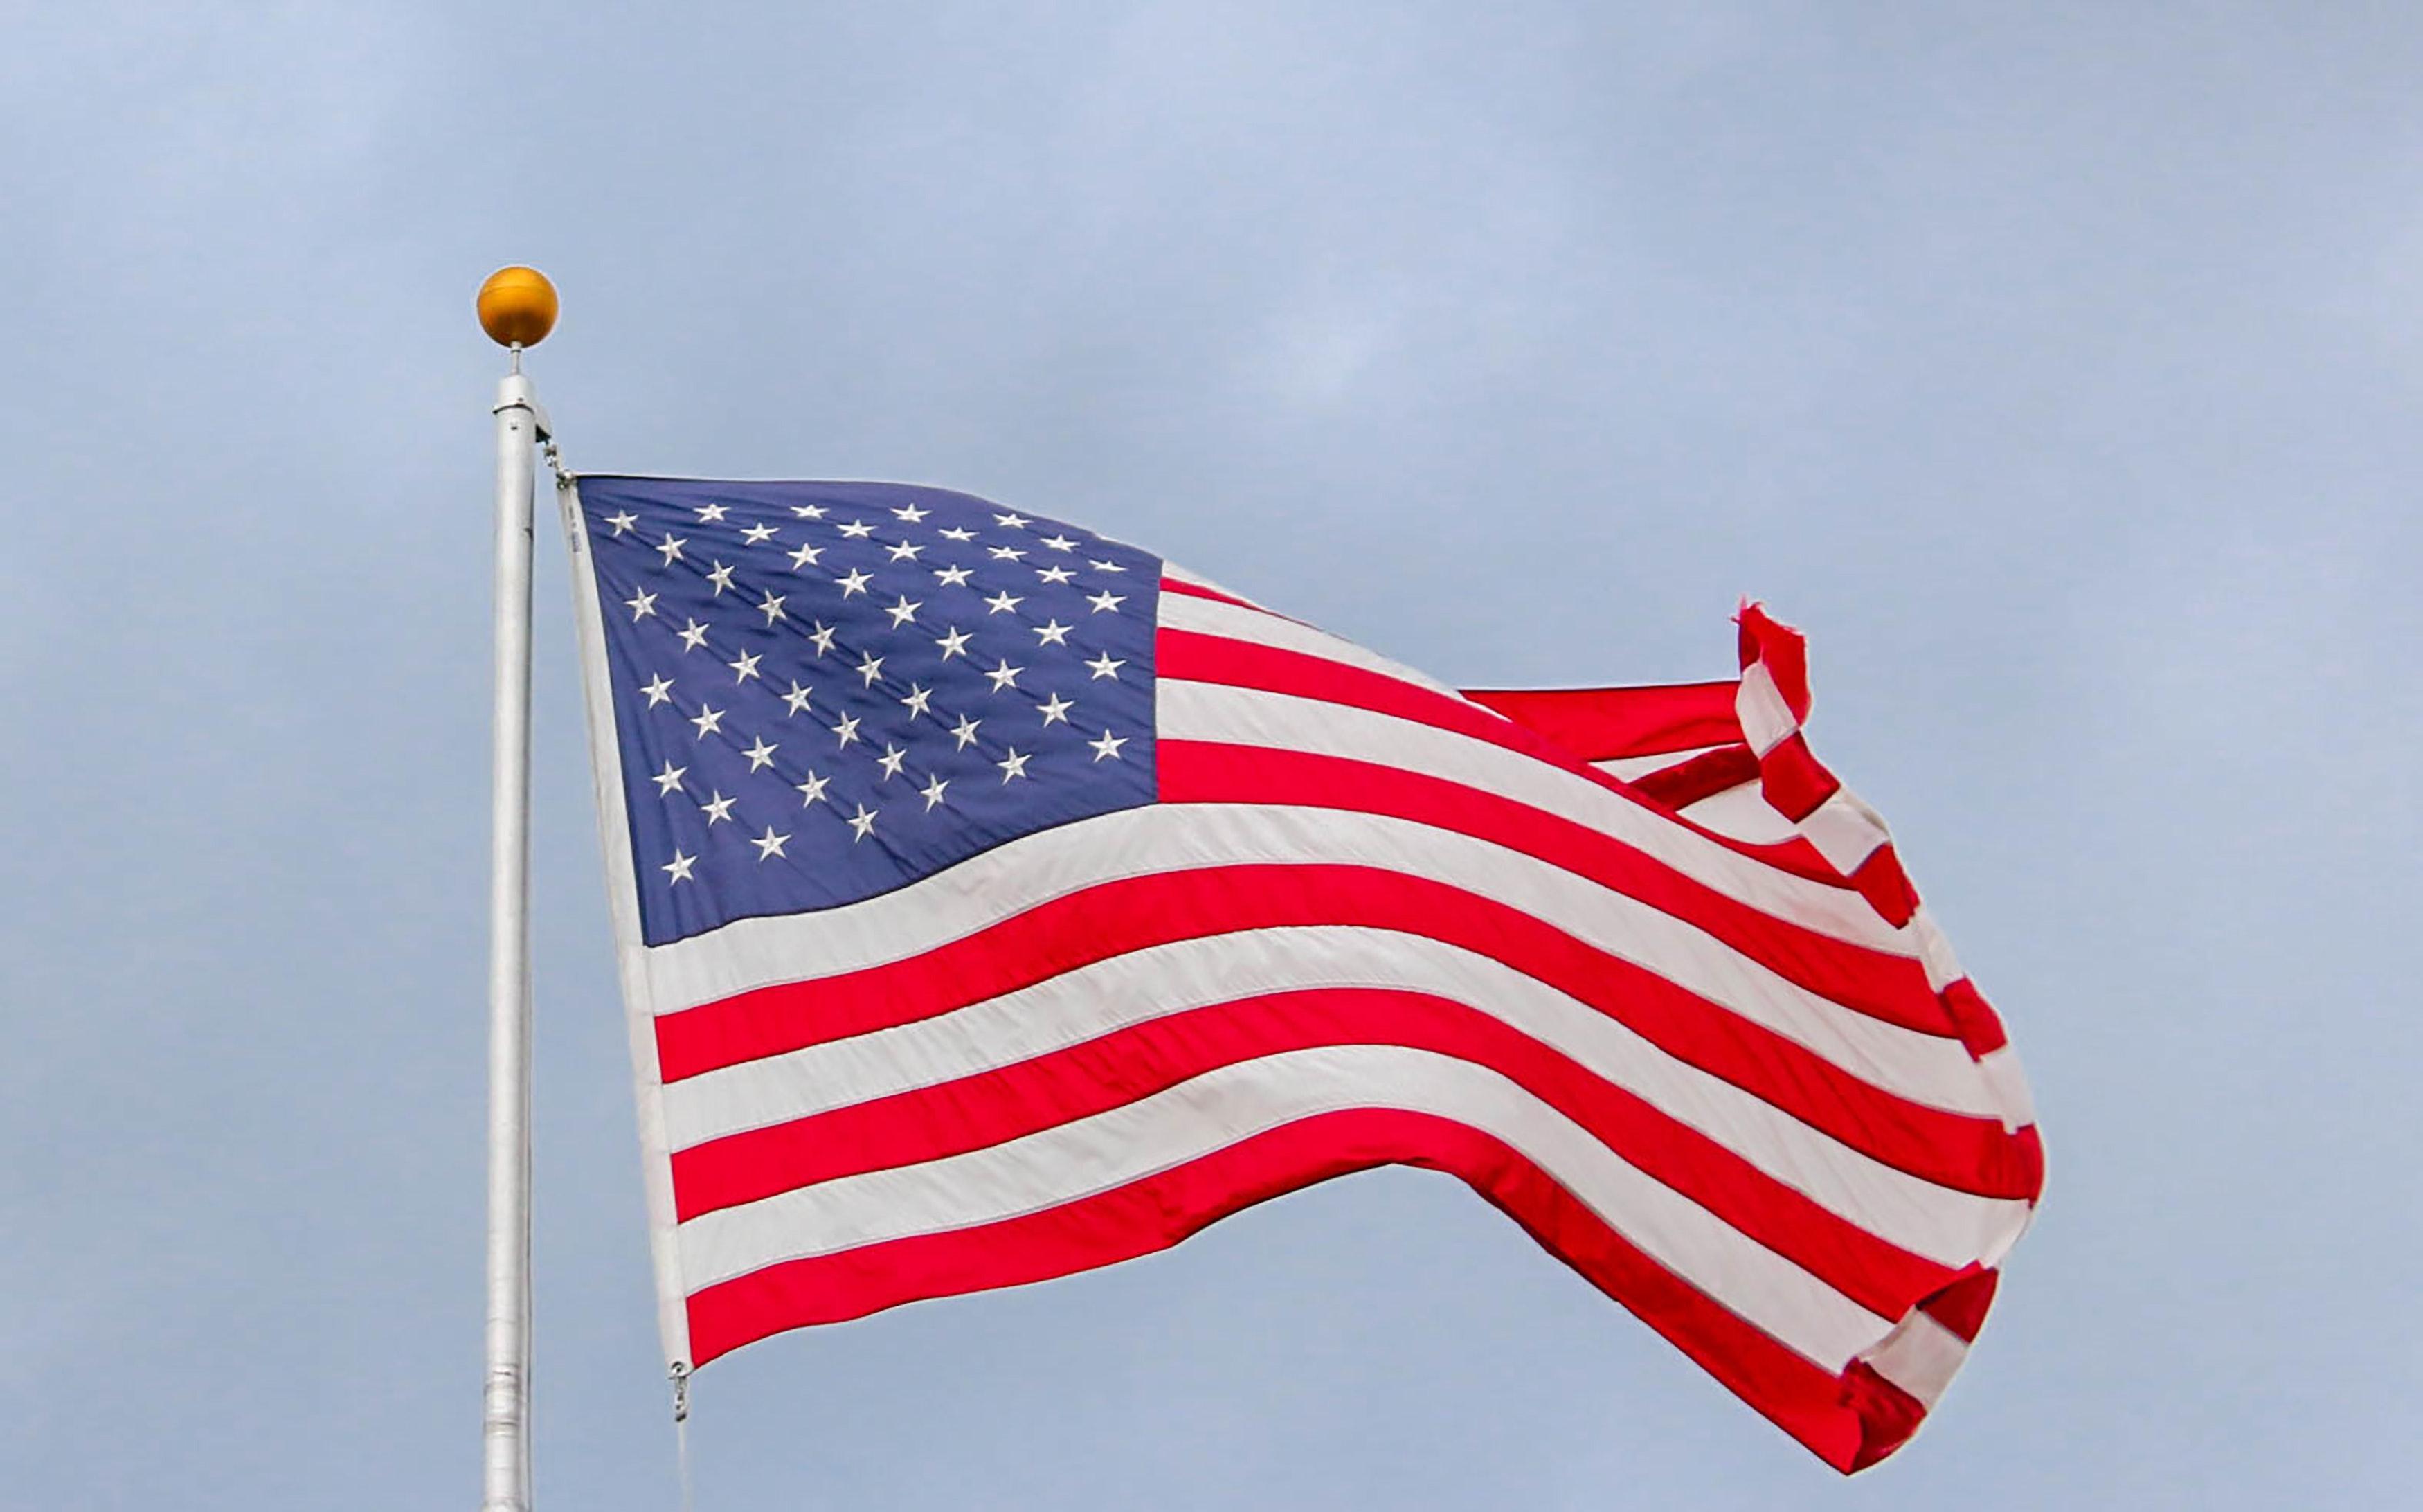 usa-flag-waving-on-white-metal-pole-1550342